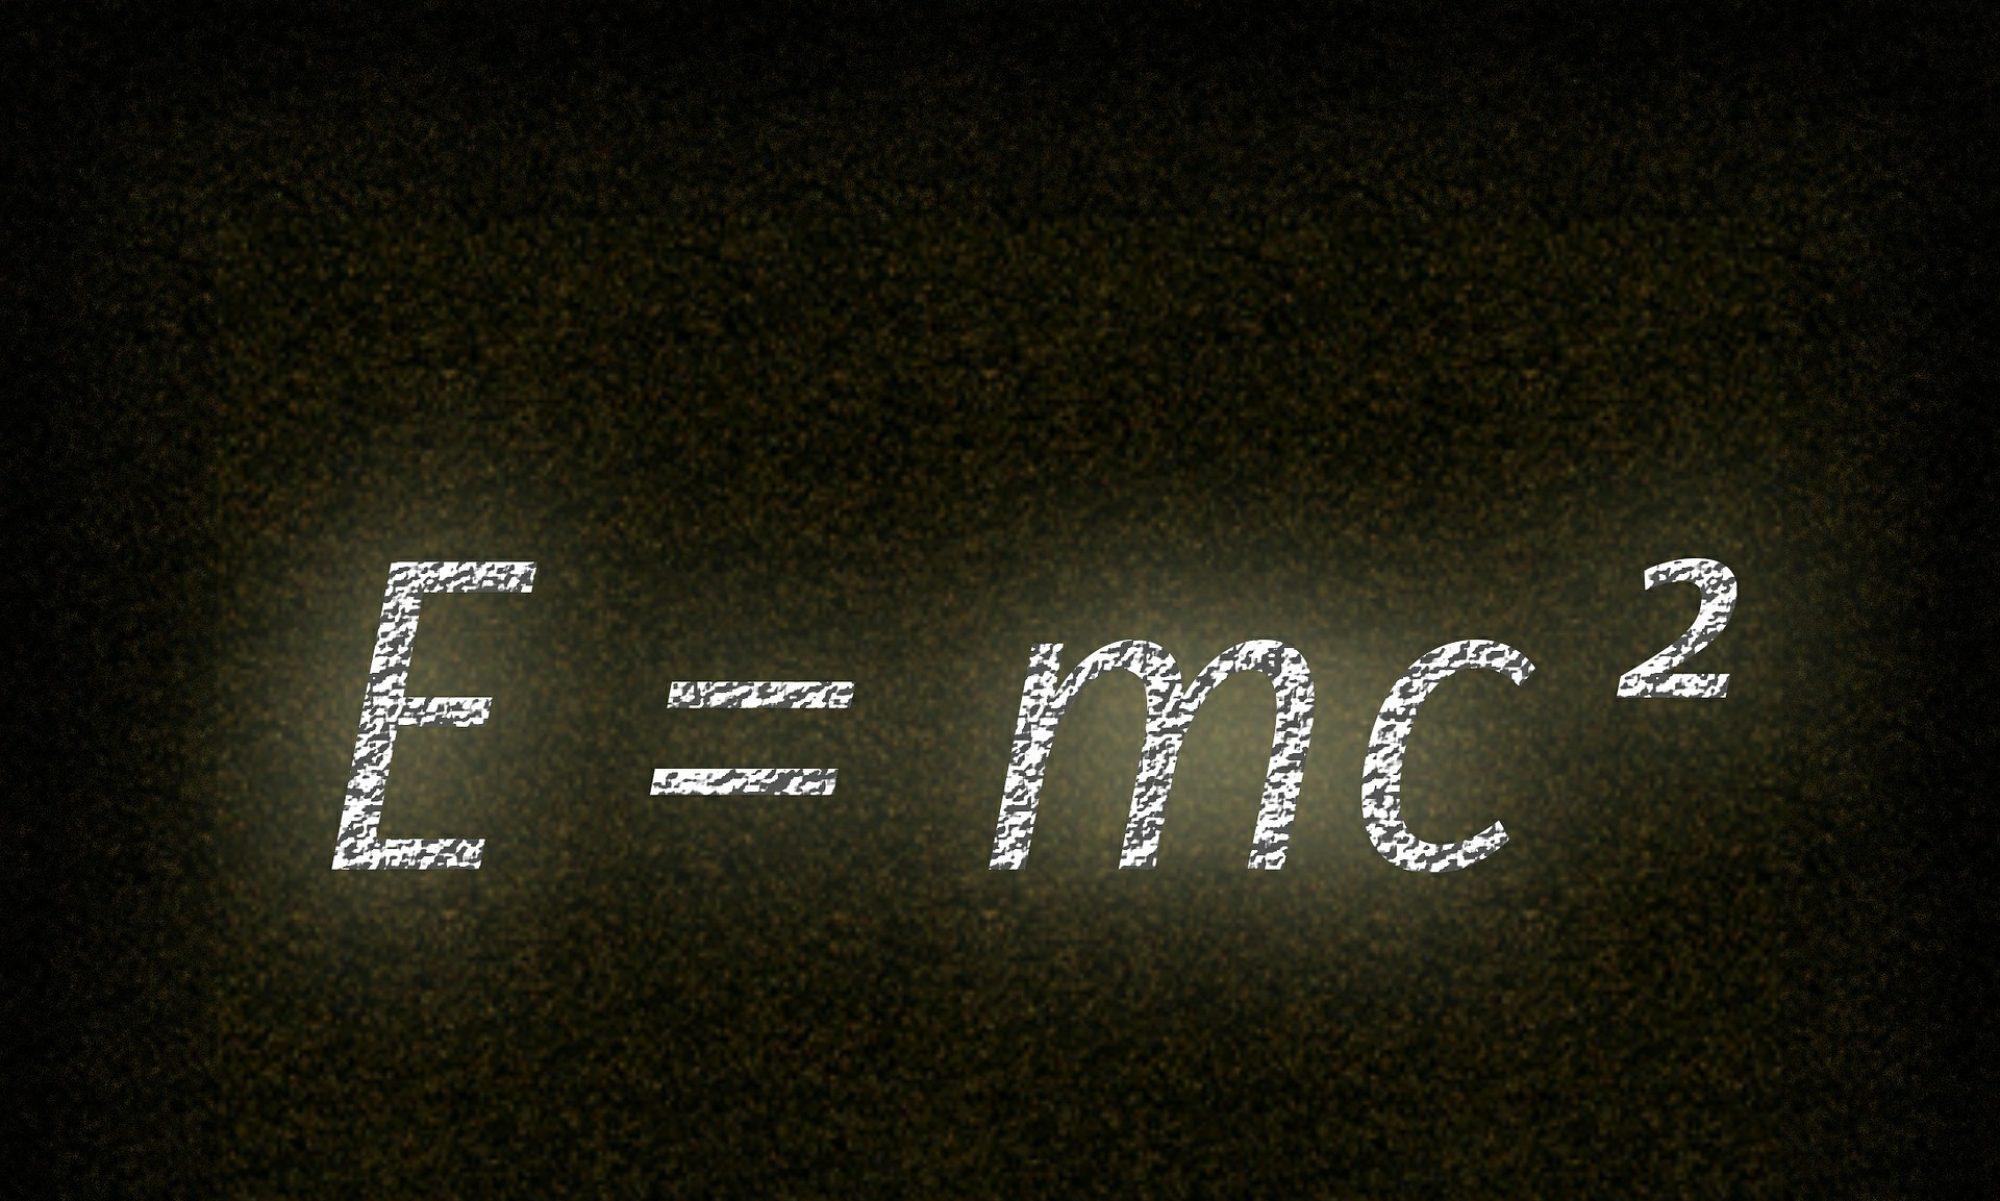 e-mpc2